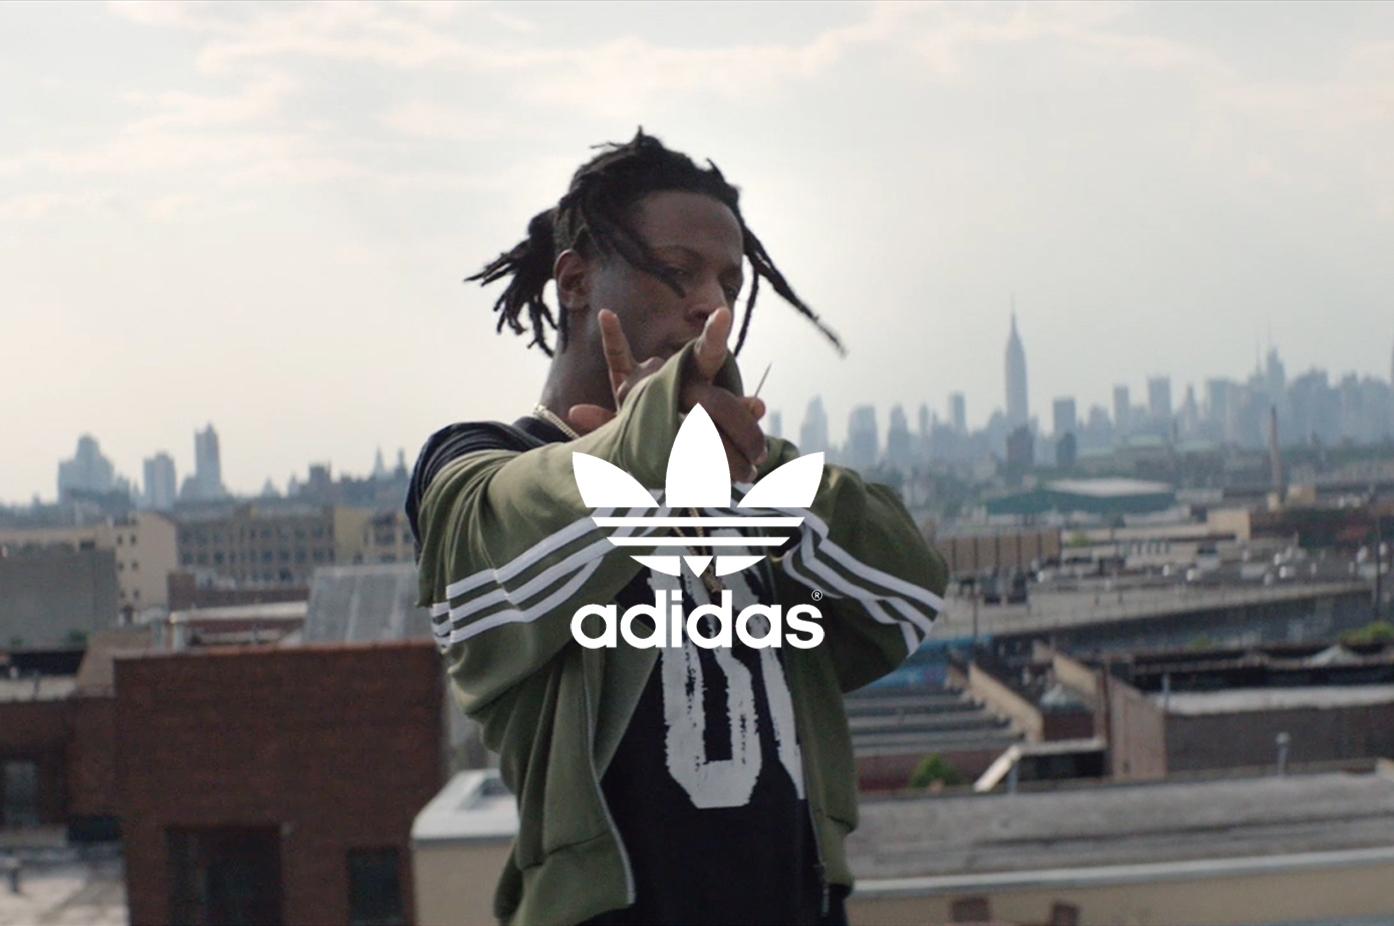 Adidas 0112 cover